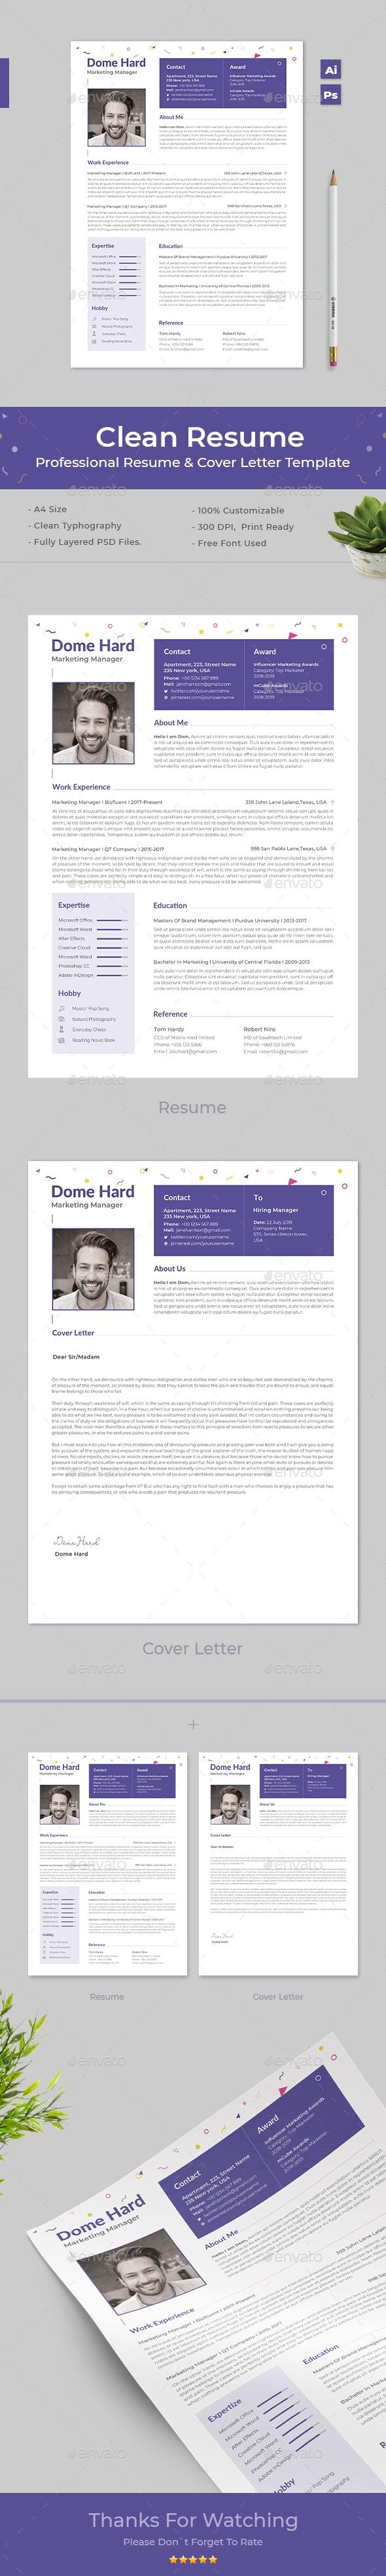 Clean Resume Clean resume, Clean resume template, Resume